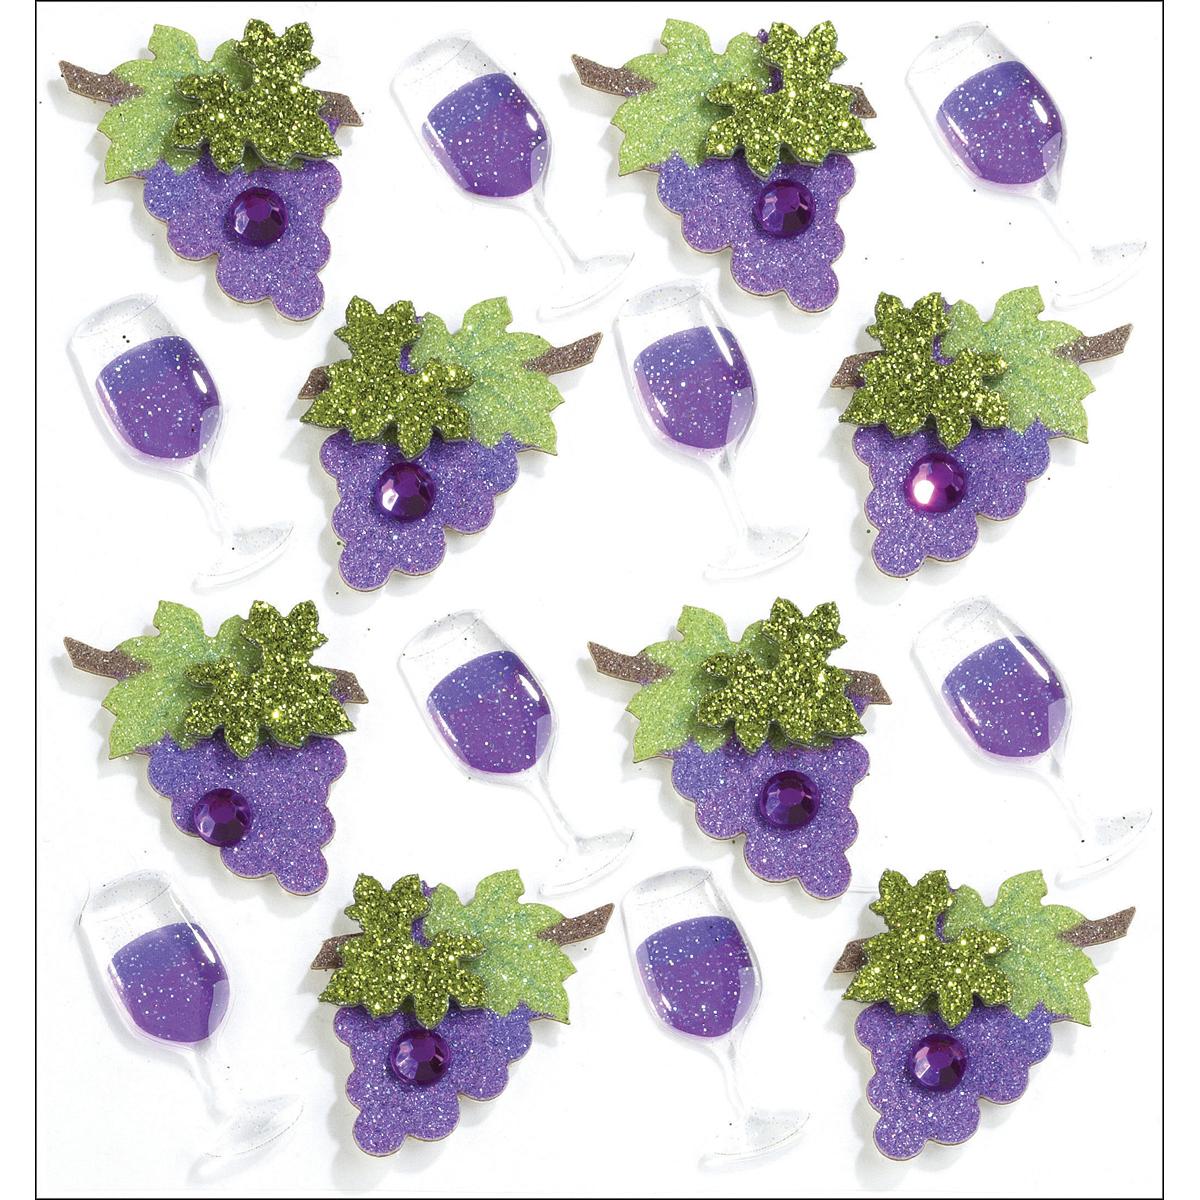 Wine Glasses & Grapes Dimensional Stickers